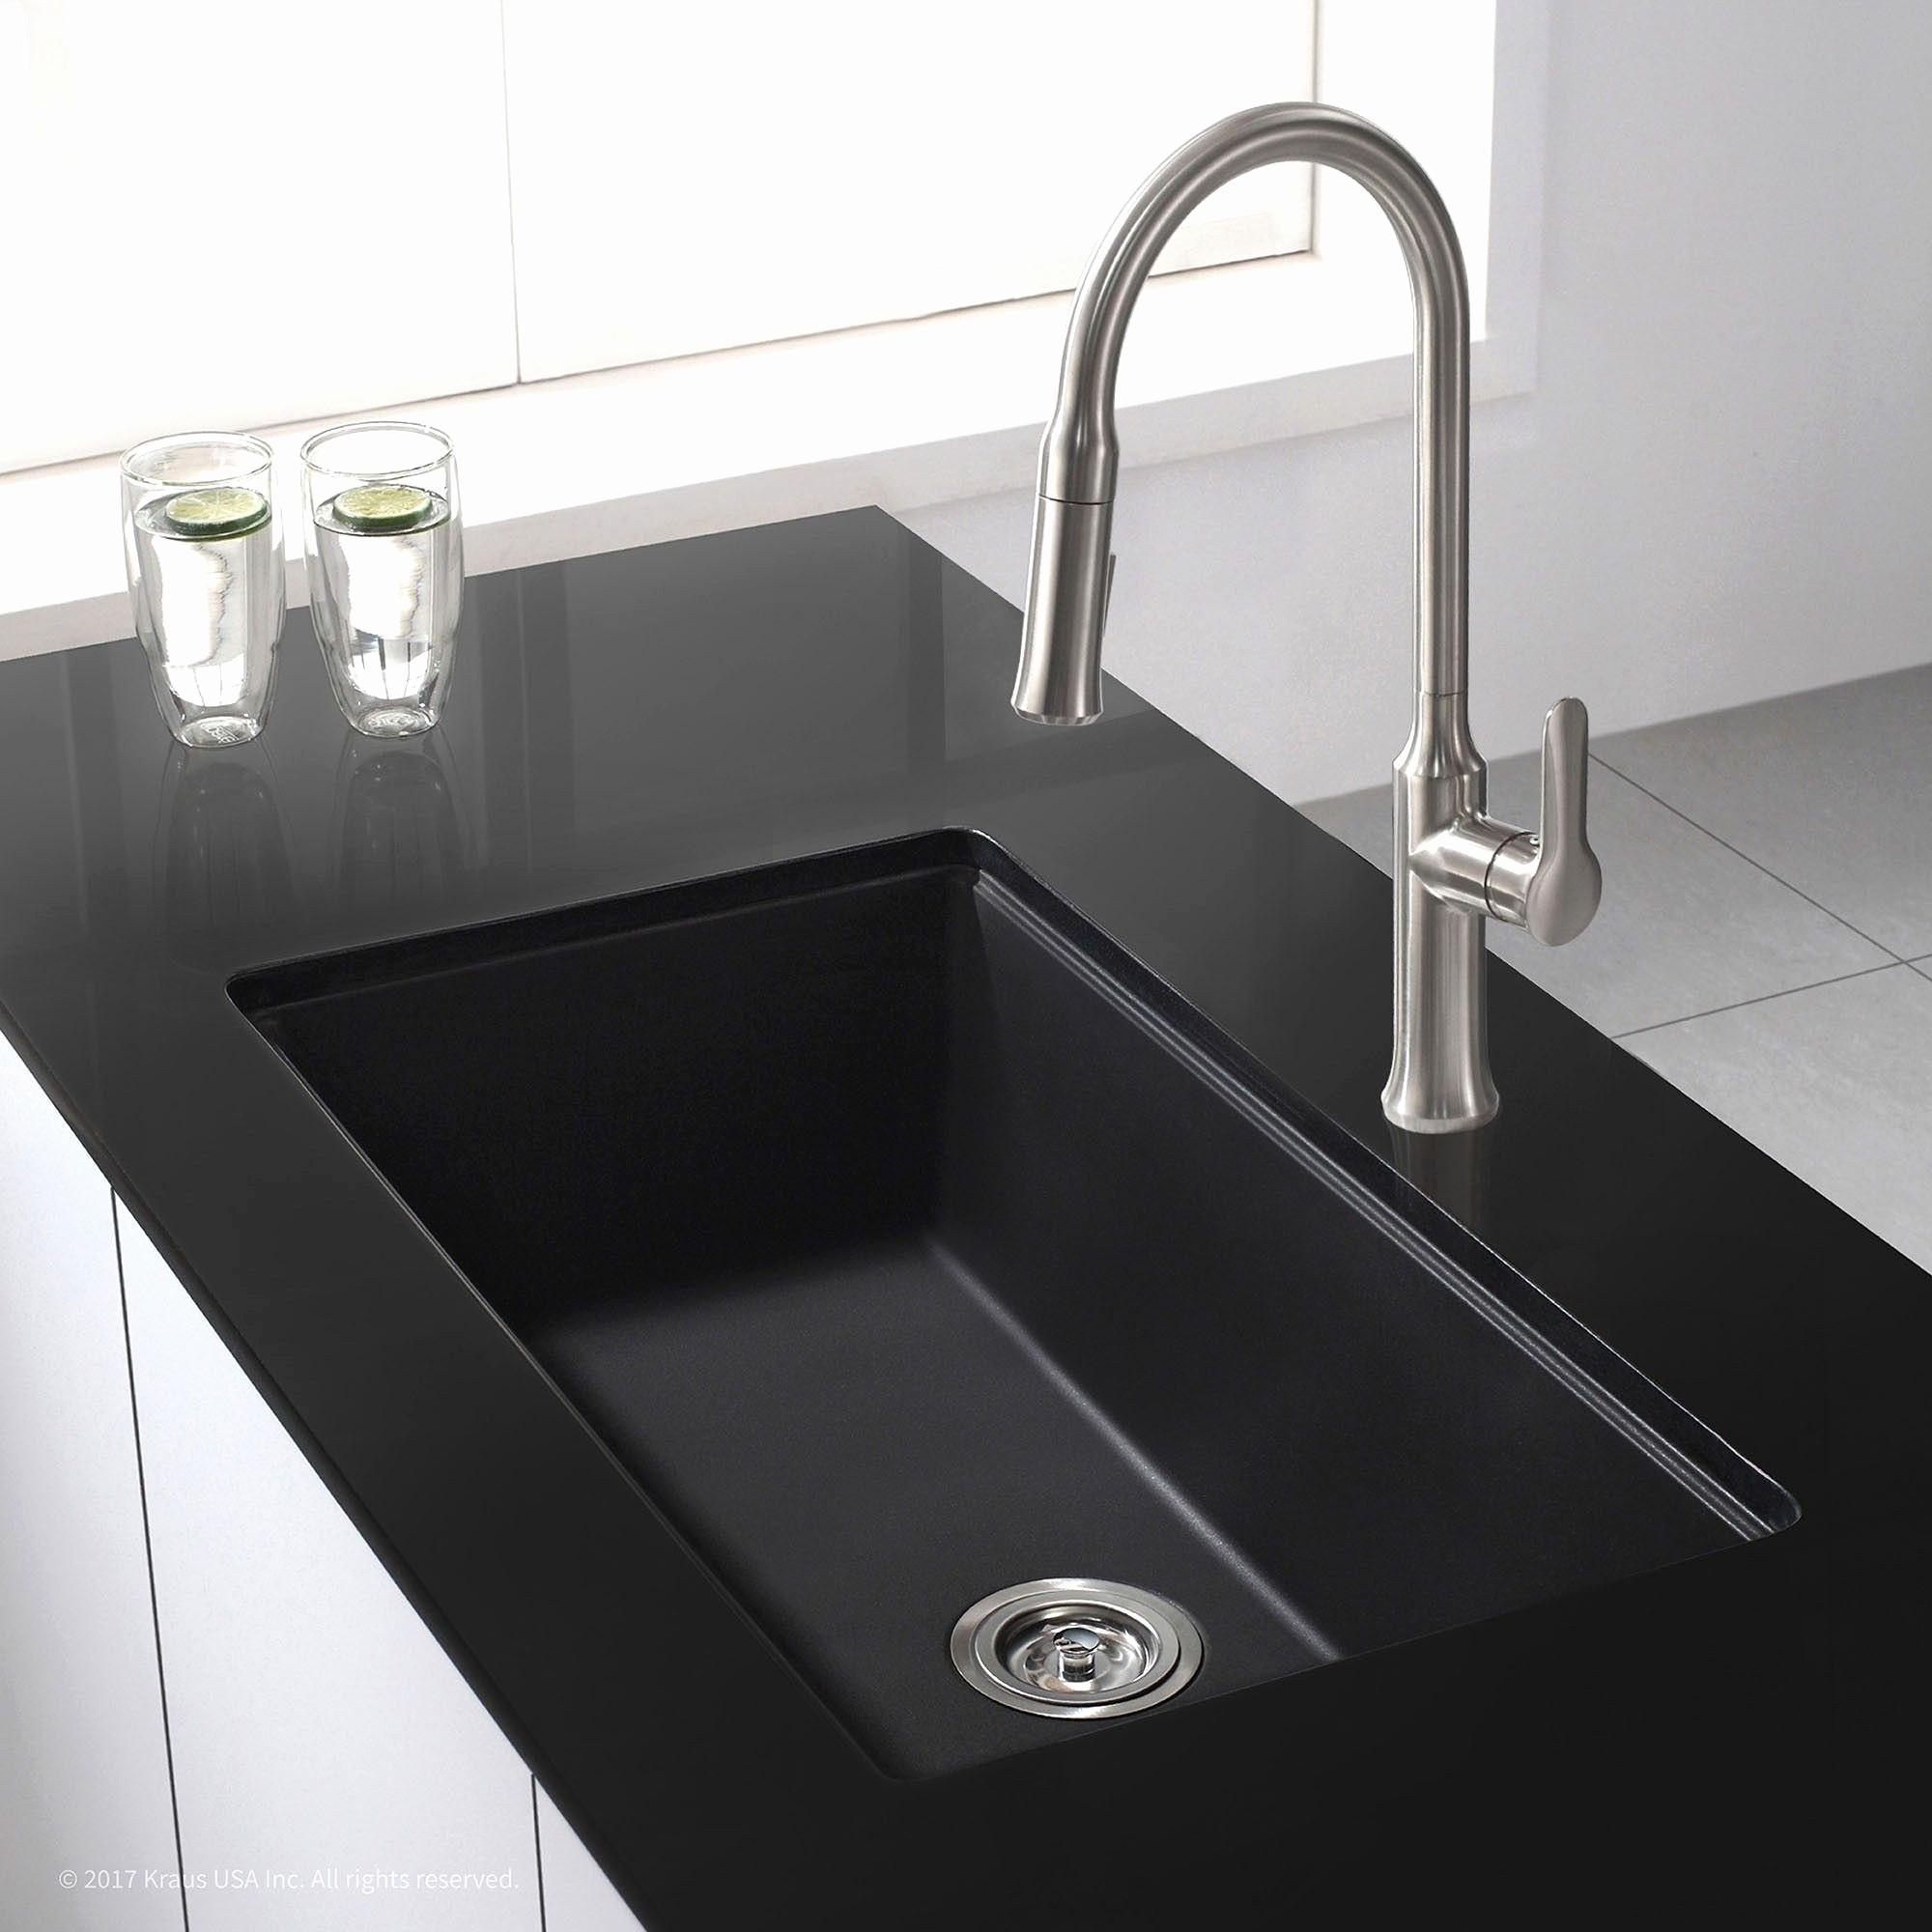 16 Perfect Kitchen Designs For Classy Homes: Meuble Ikea Varde Inspirant Photos Meuble Ikea Varde Frais